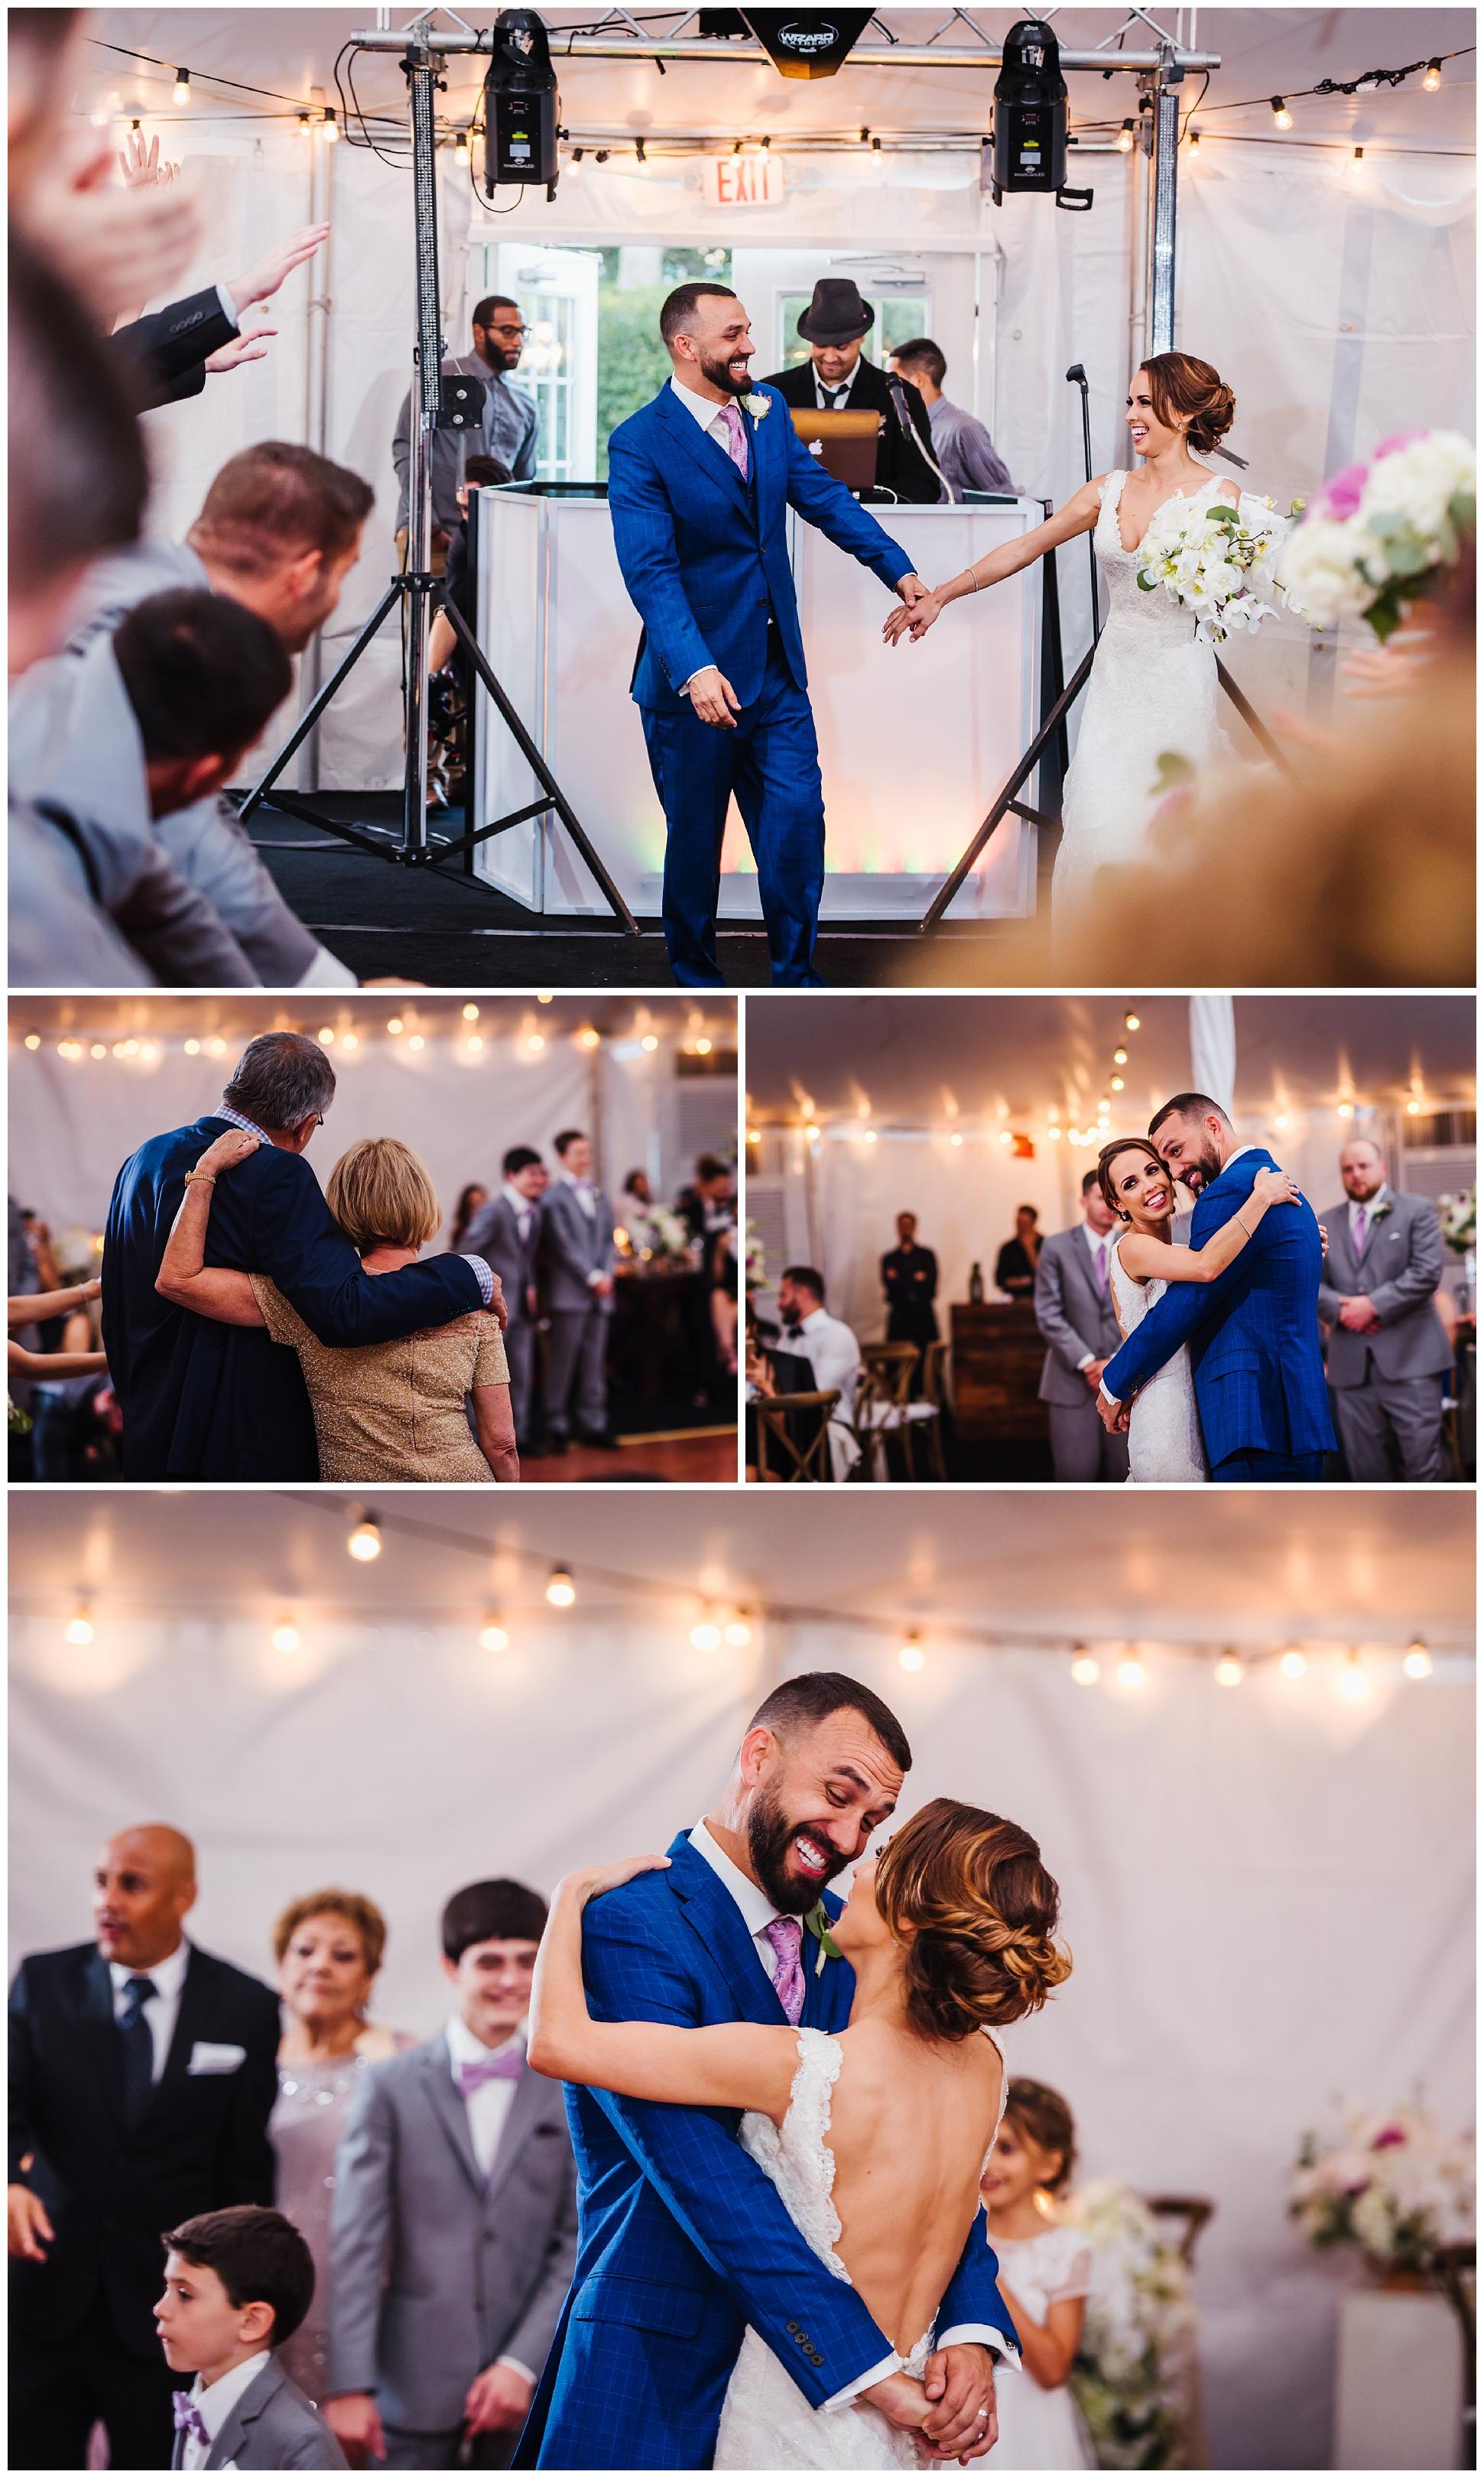 Tampa-luxury-wedding-photographer-mision-lago-private-estate_0051.jpg